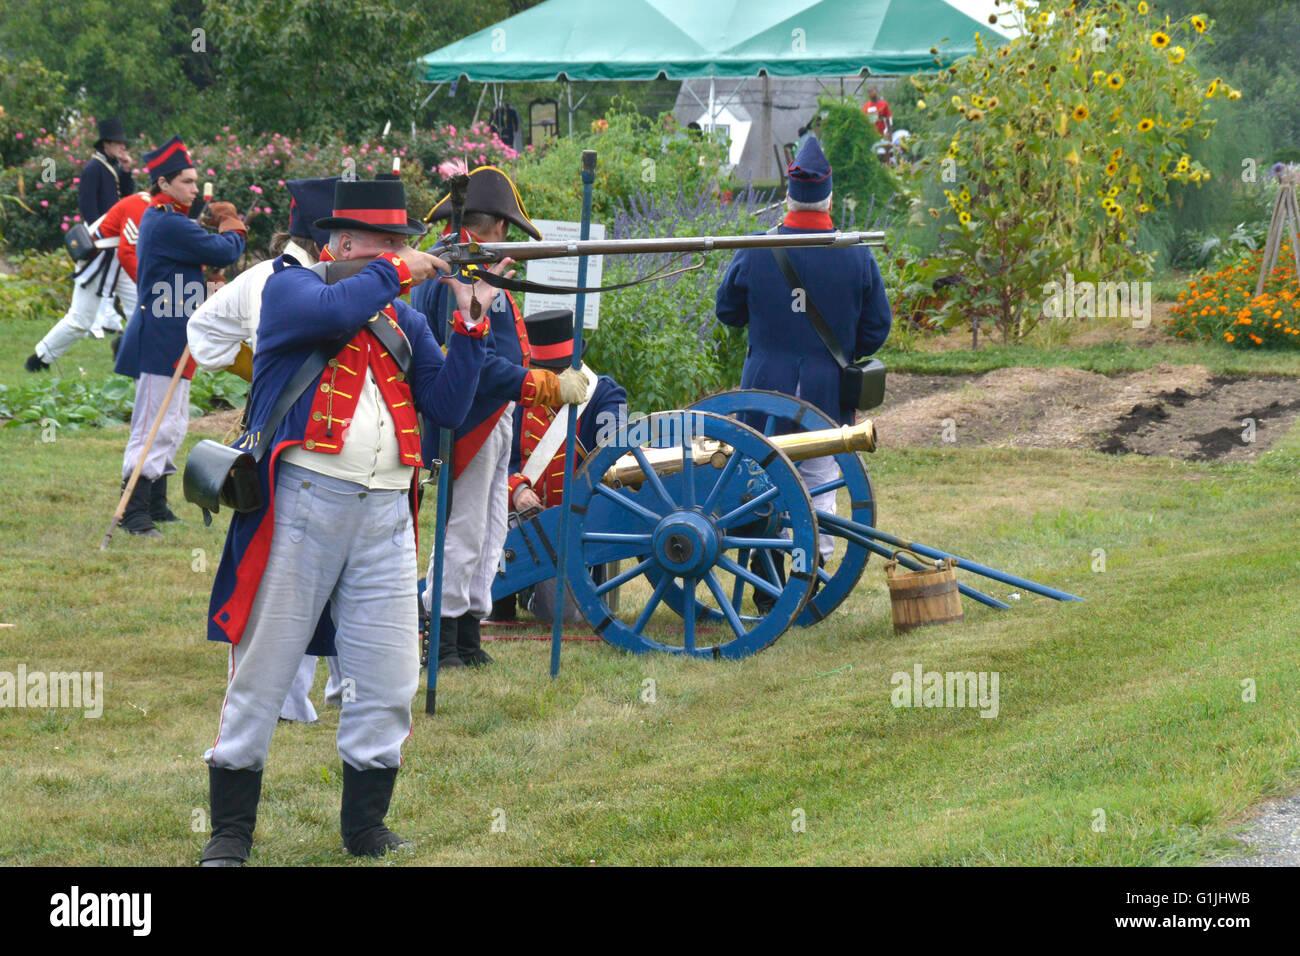 Battle of Bladensburg reenactment - Stock Image